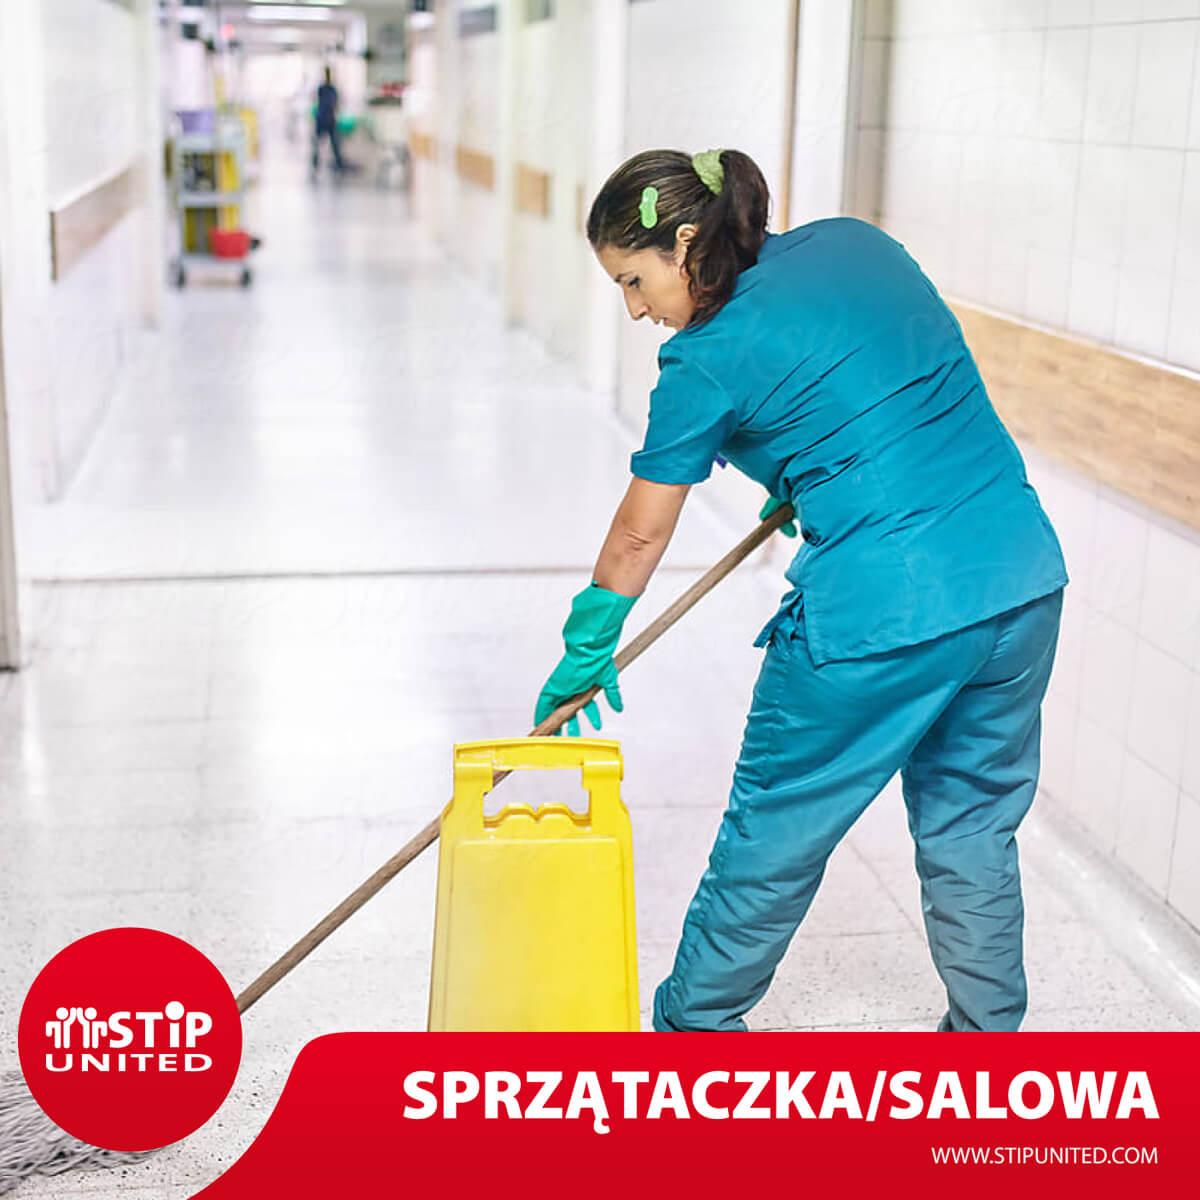 STIP-praca-PERSONEL-SZPITALE-1.jpg